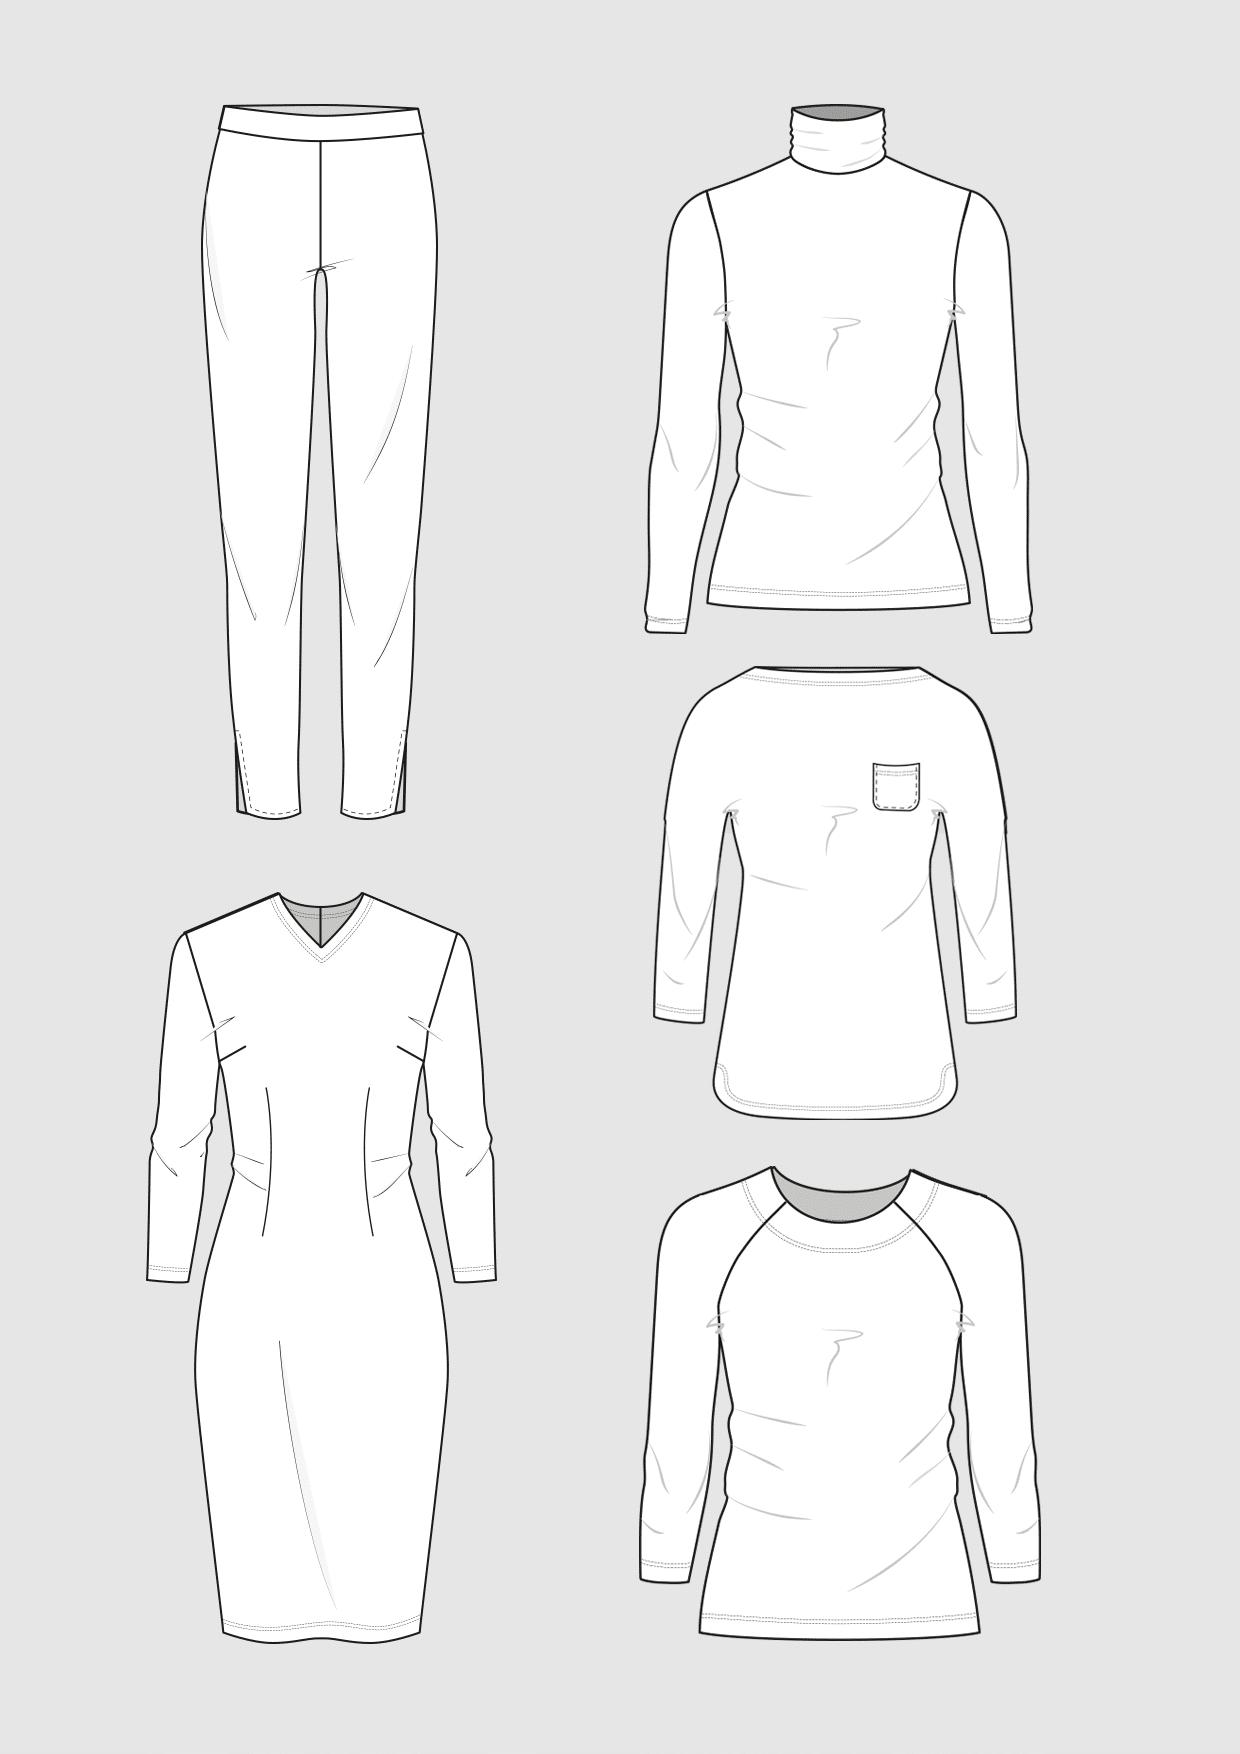 Produkt: Schnittmuster Jersey-Basics